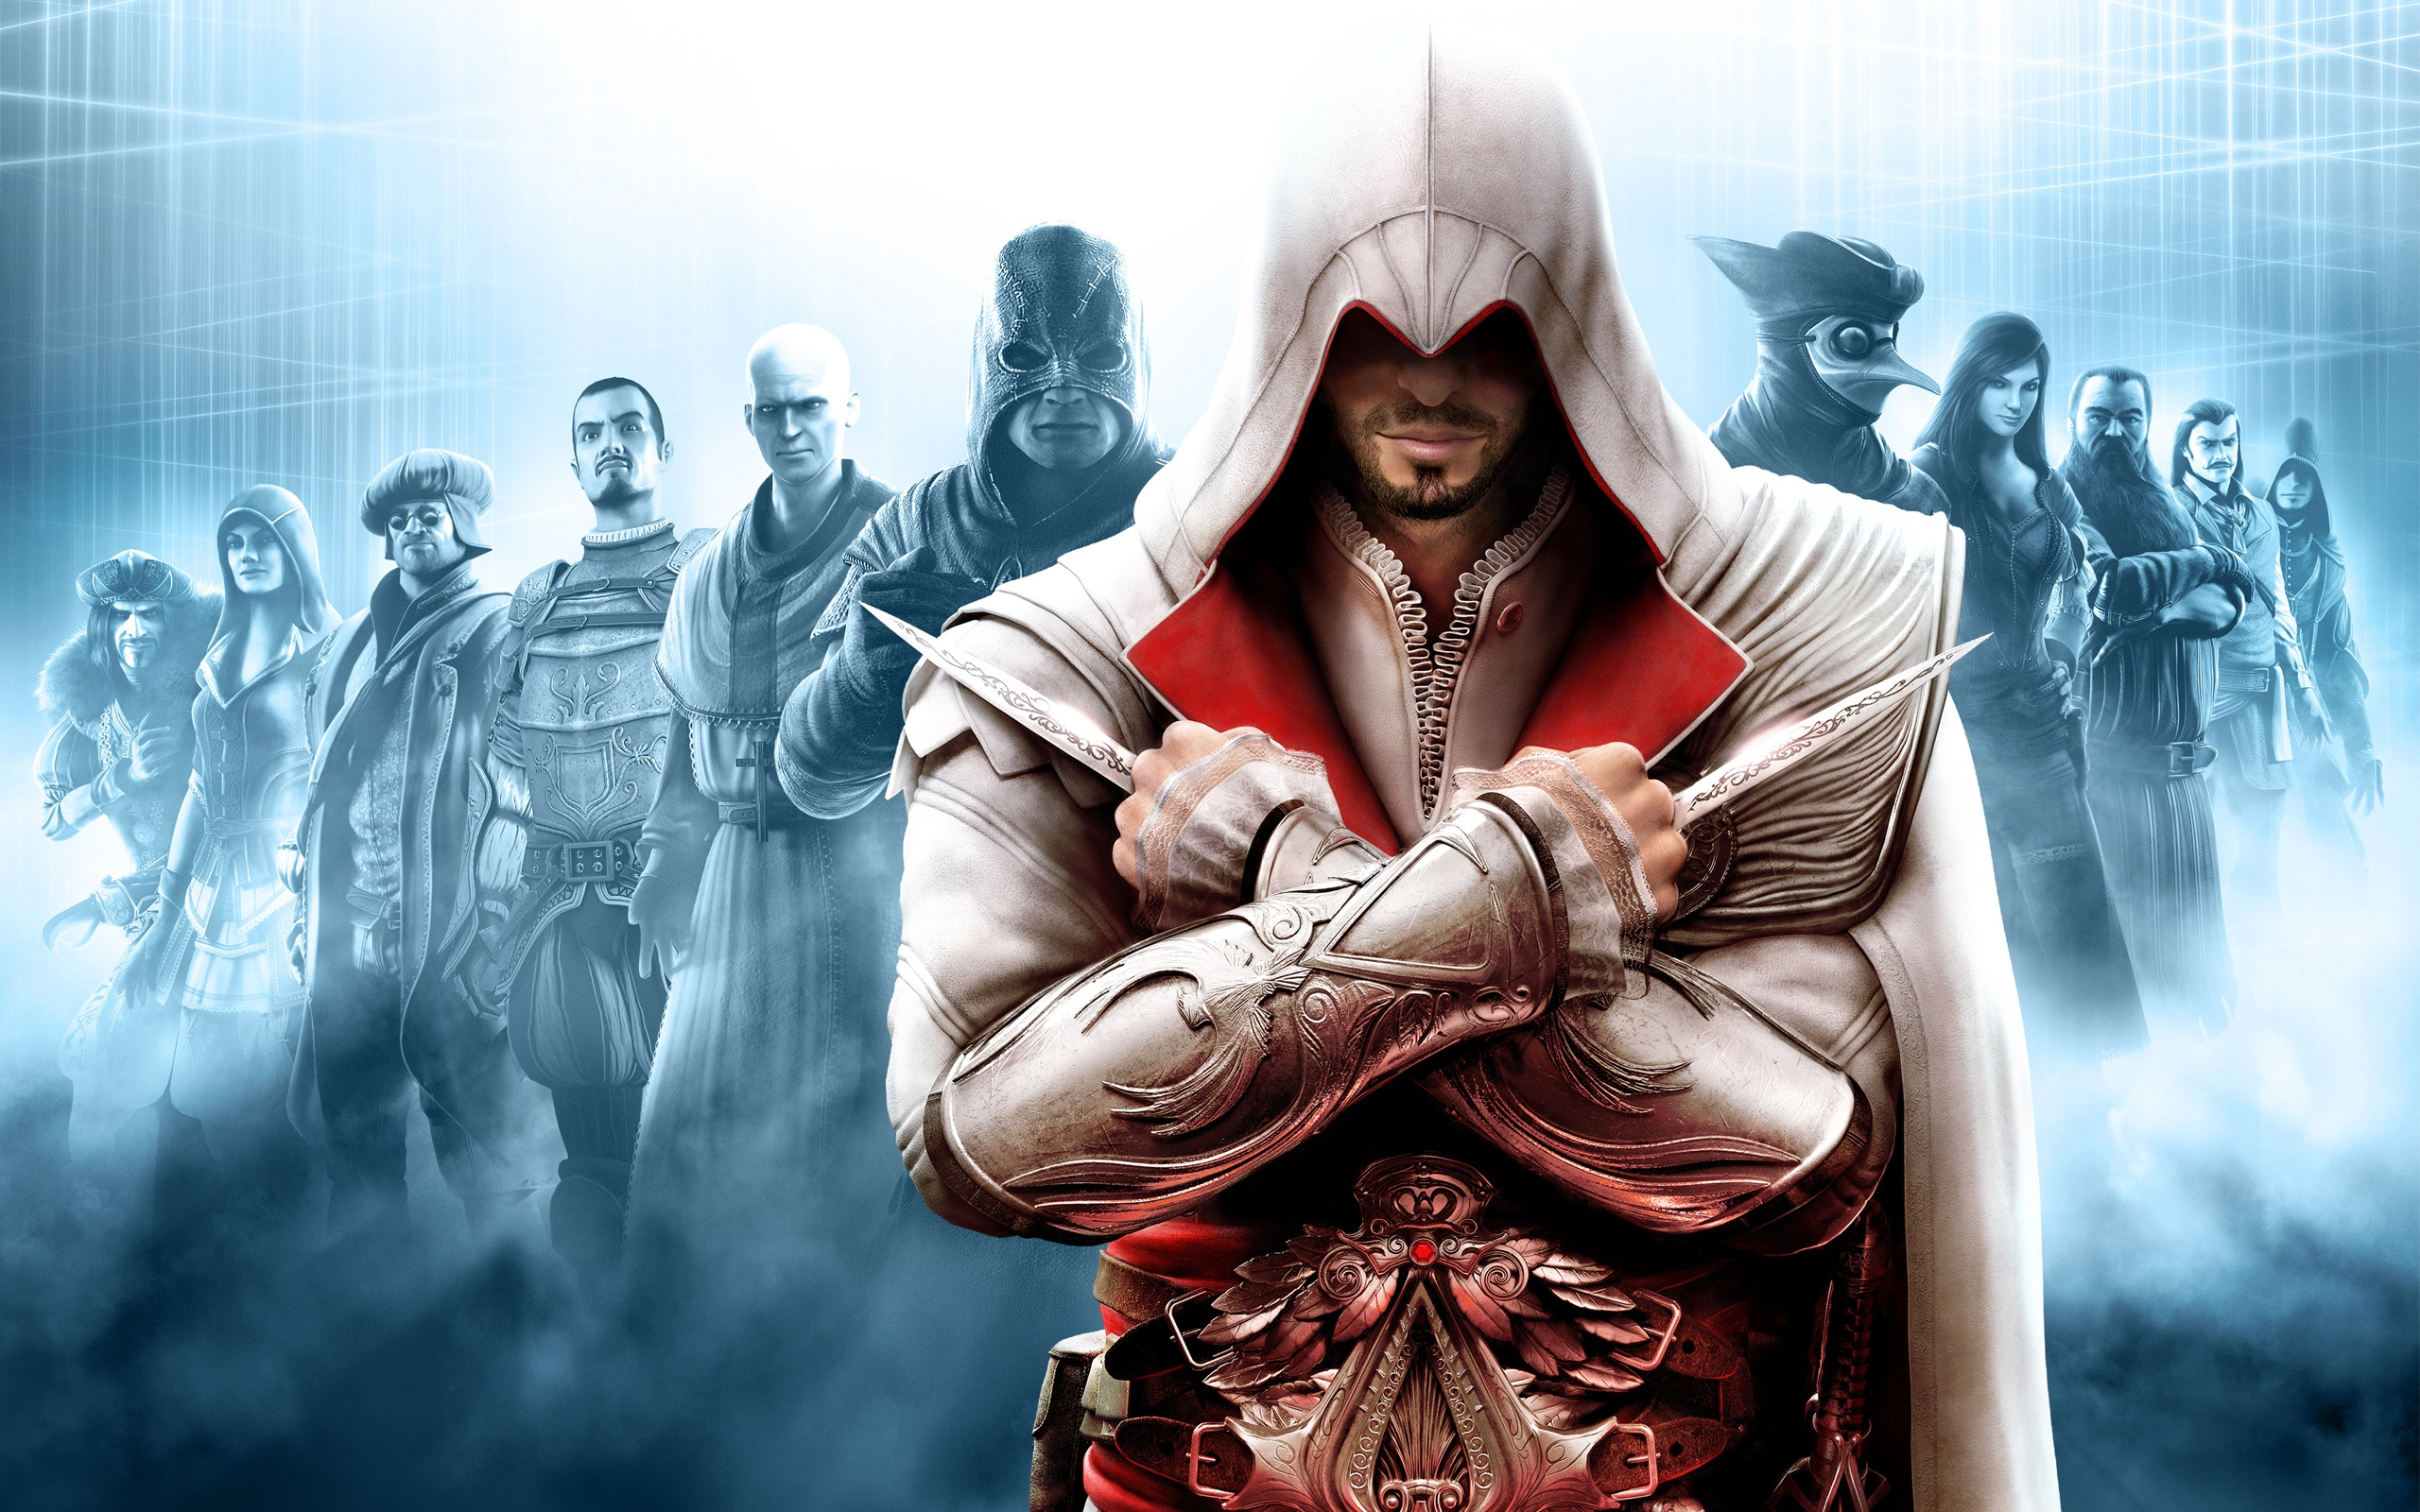 Assassins Creed Brotherhood Wallpaper: Assassin's Creed: Brotherhood Computer Wallpapers, Desktop